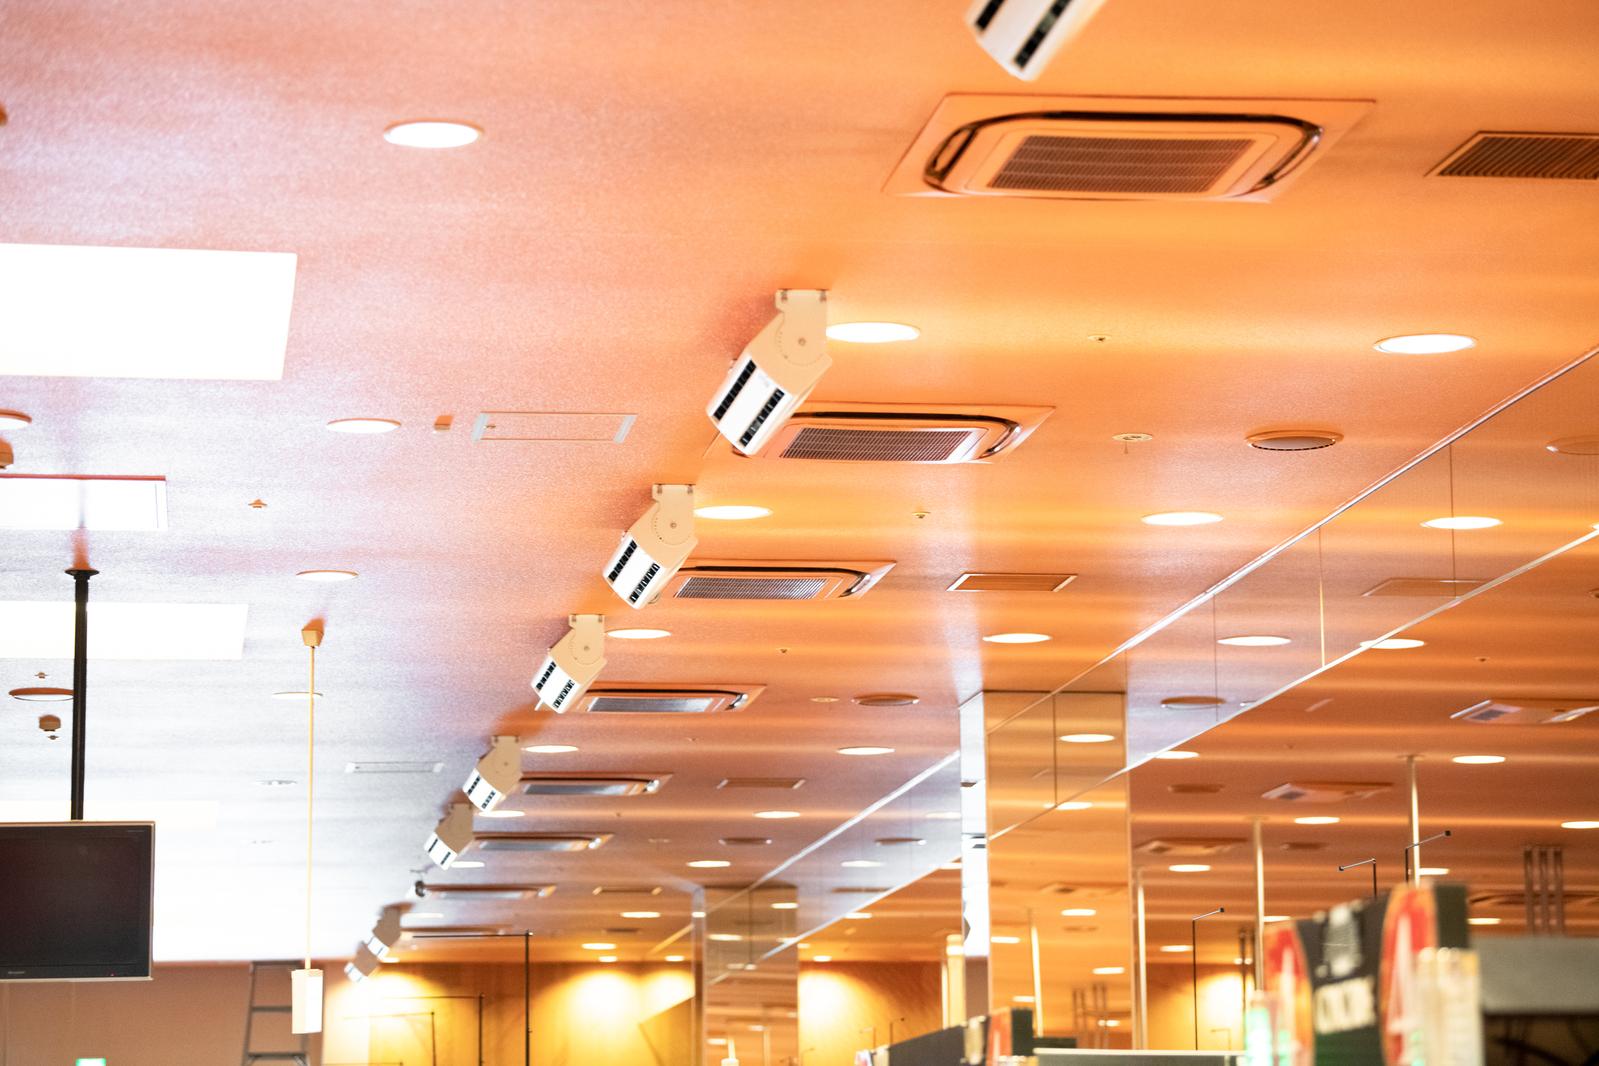 空調設備の写真1